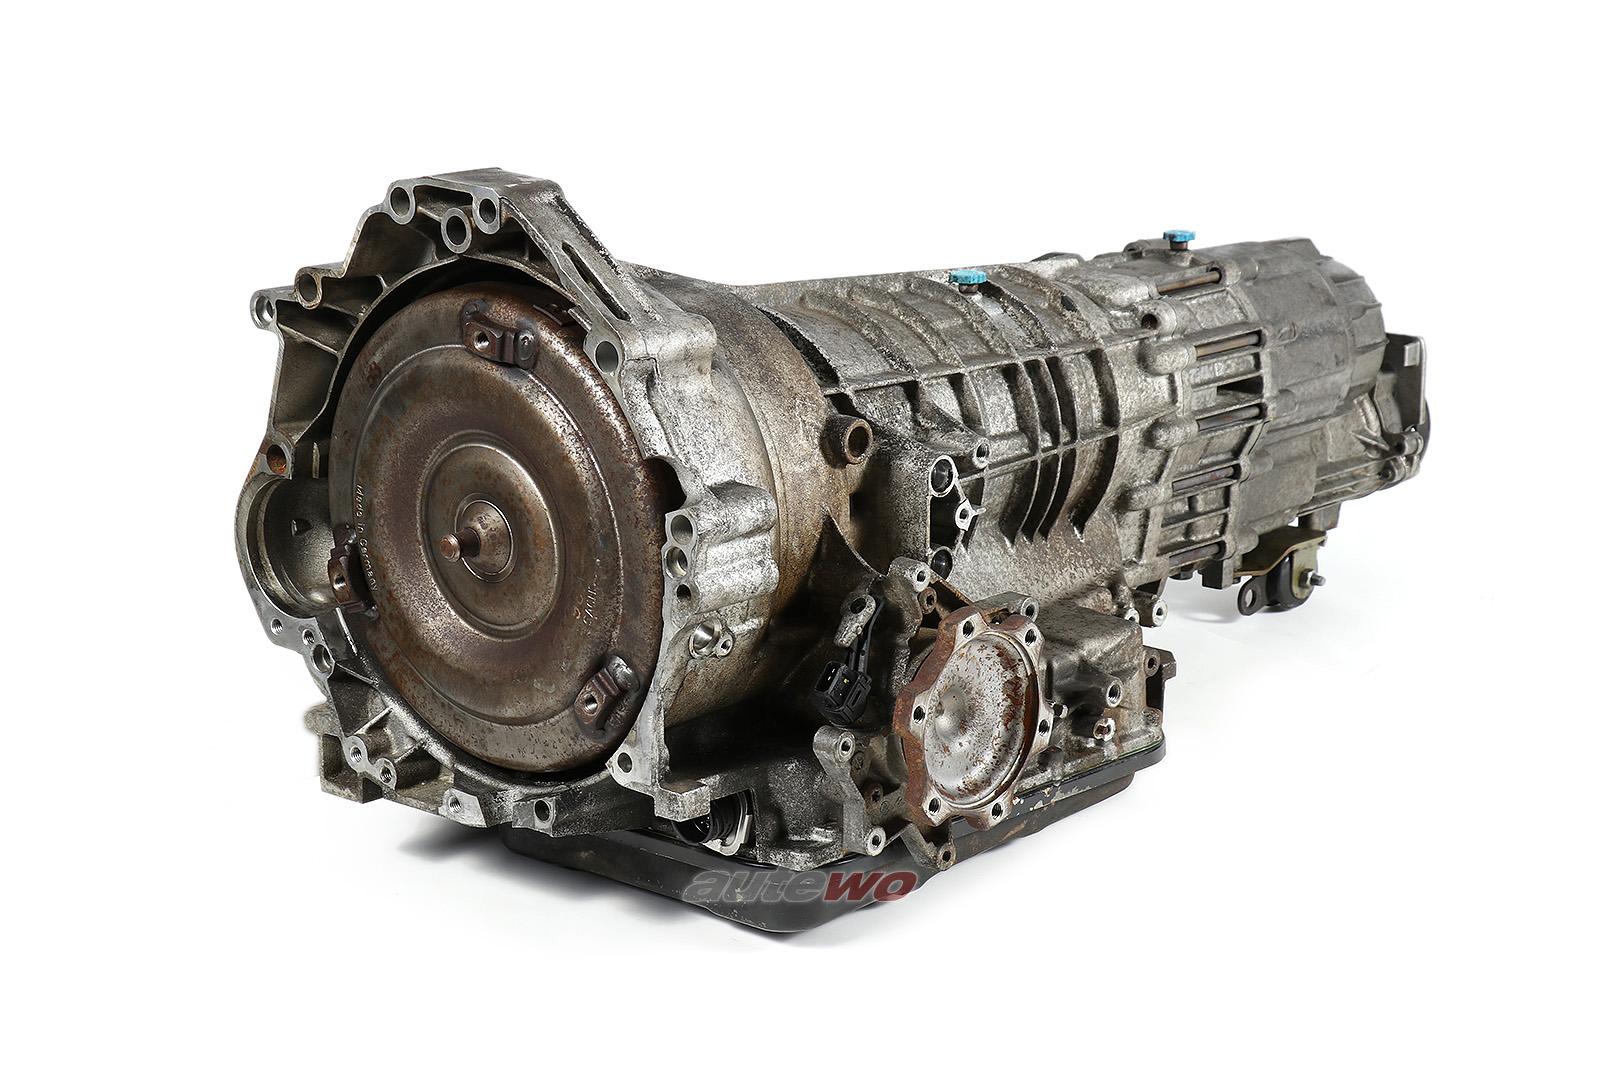 01V300041MX Audi A6 4B 2.5 TDI Quattro-Tiptronic-Getriebe DEW 0119840 137500km